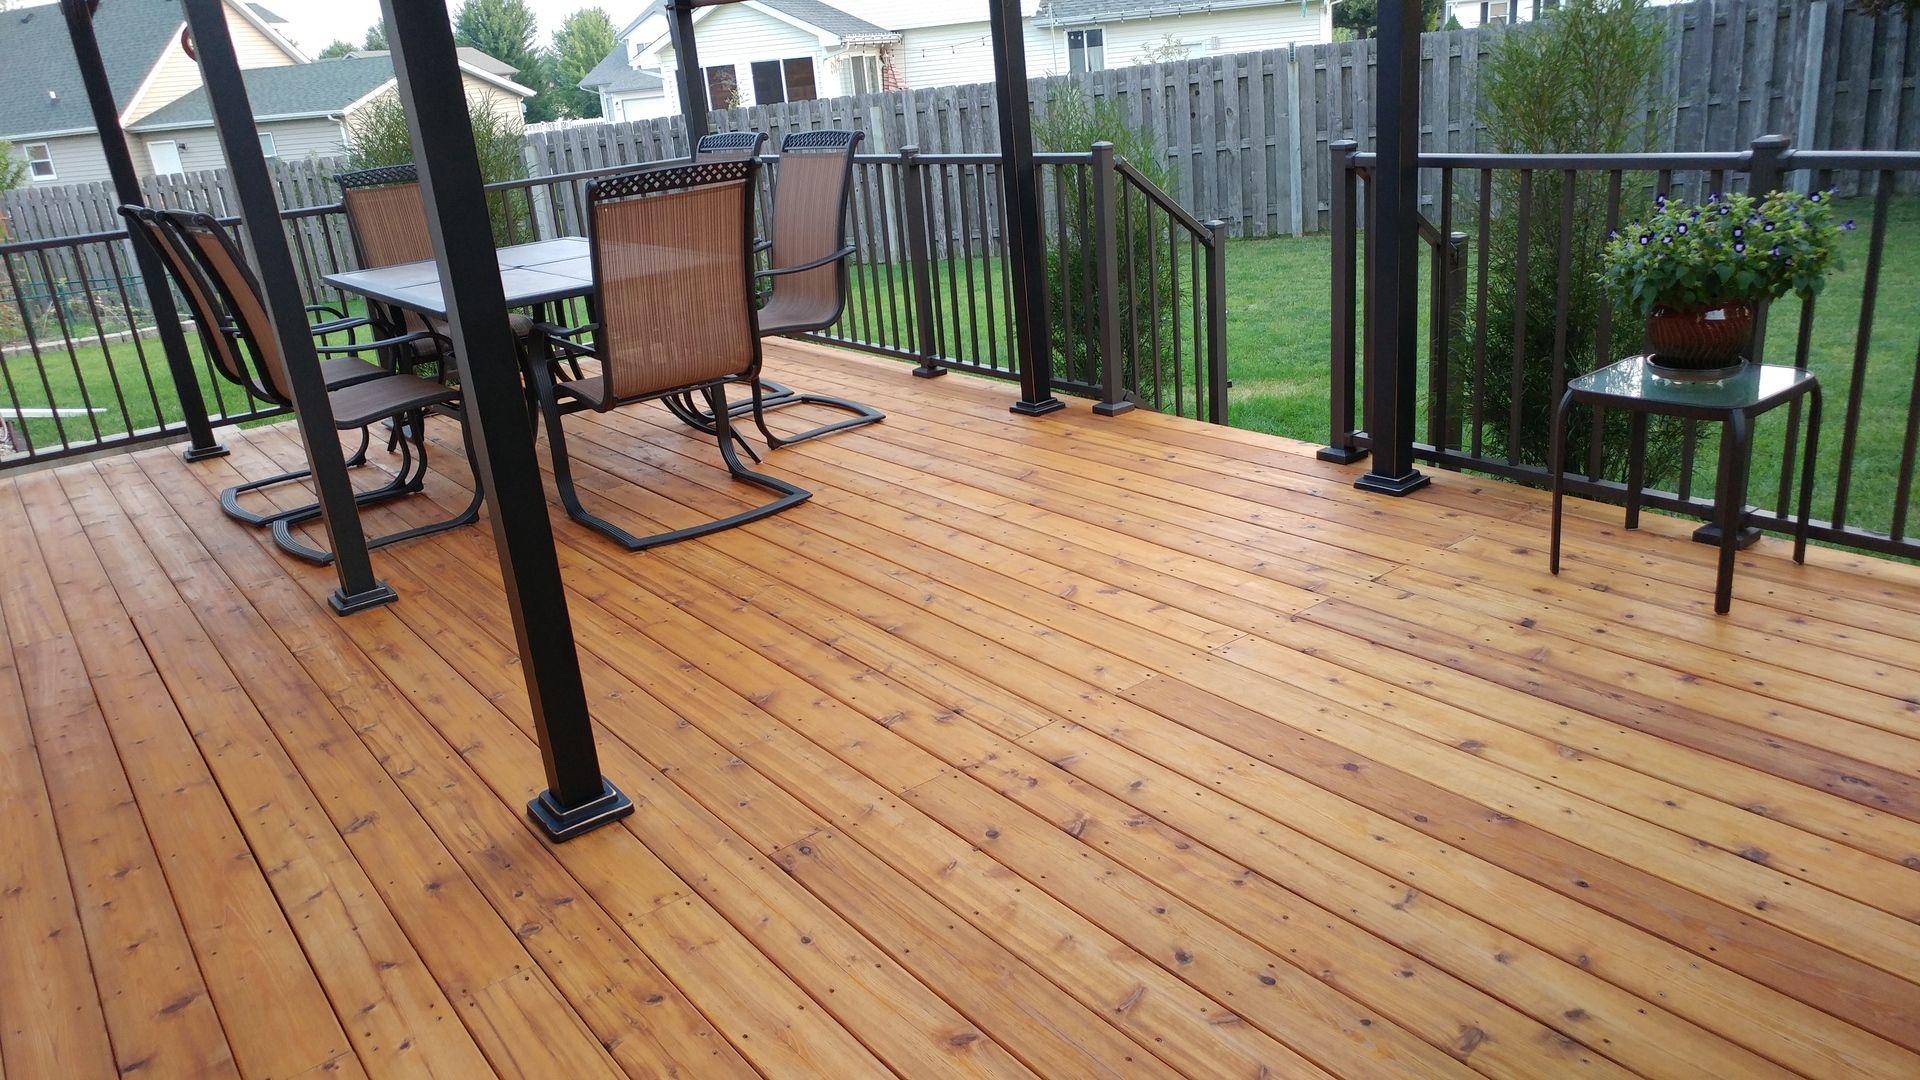 Decksdirect Cedar Oil By Penofin Staining Deck Deck Stain And Sealer Cedar Oil